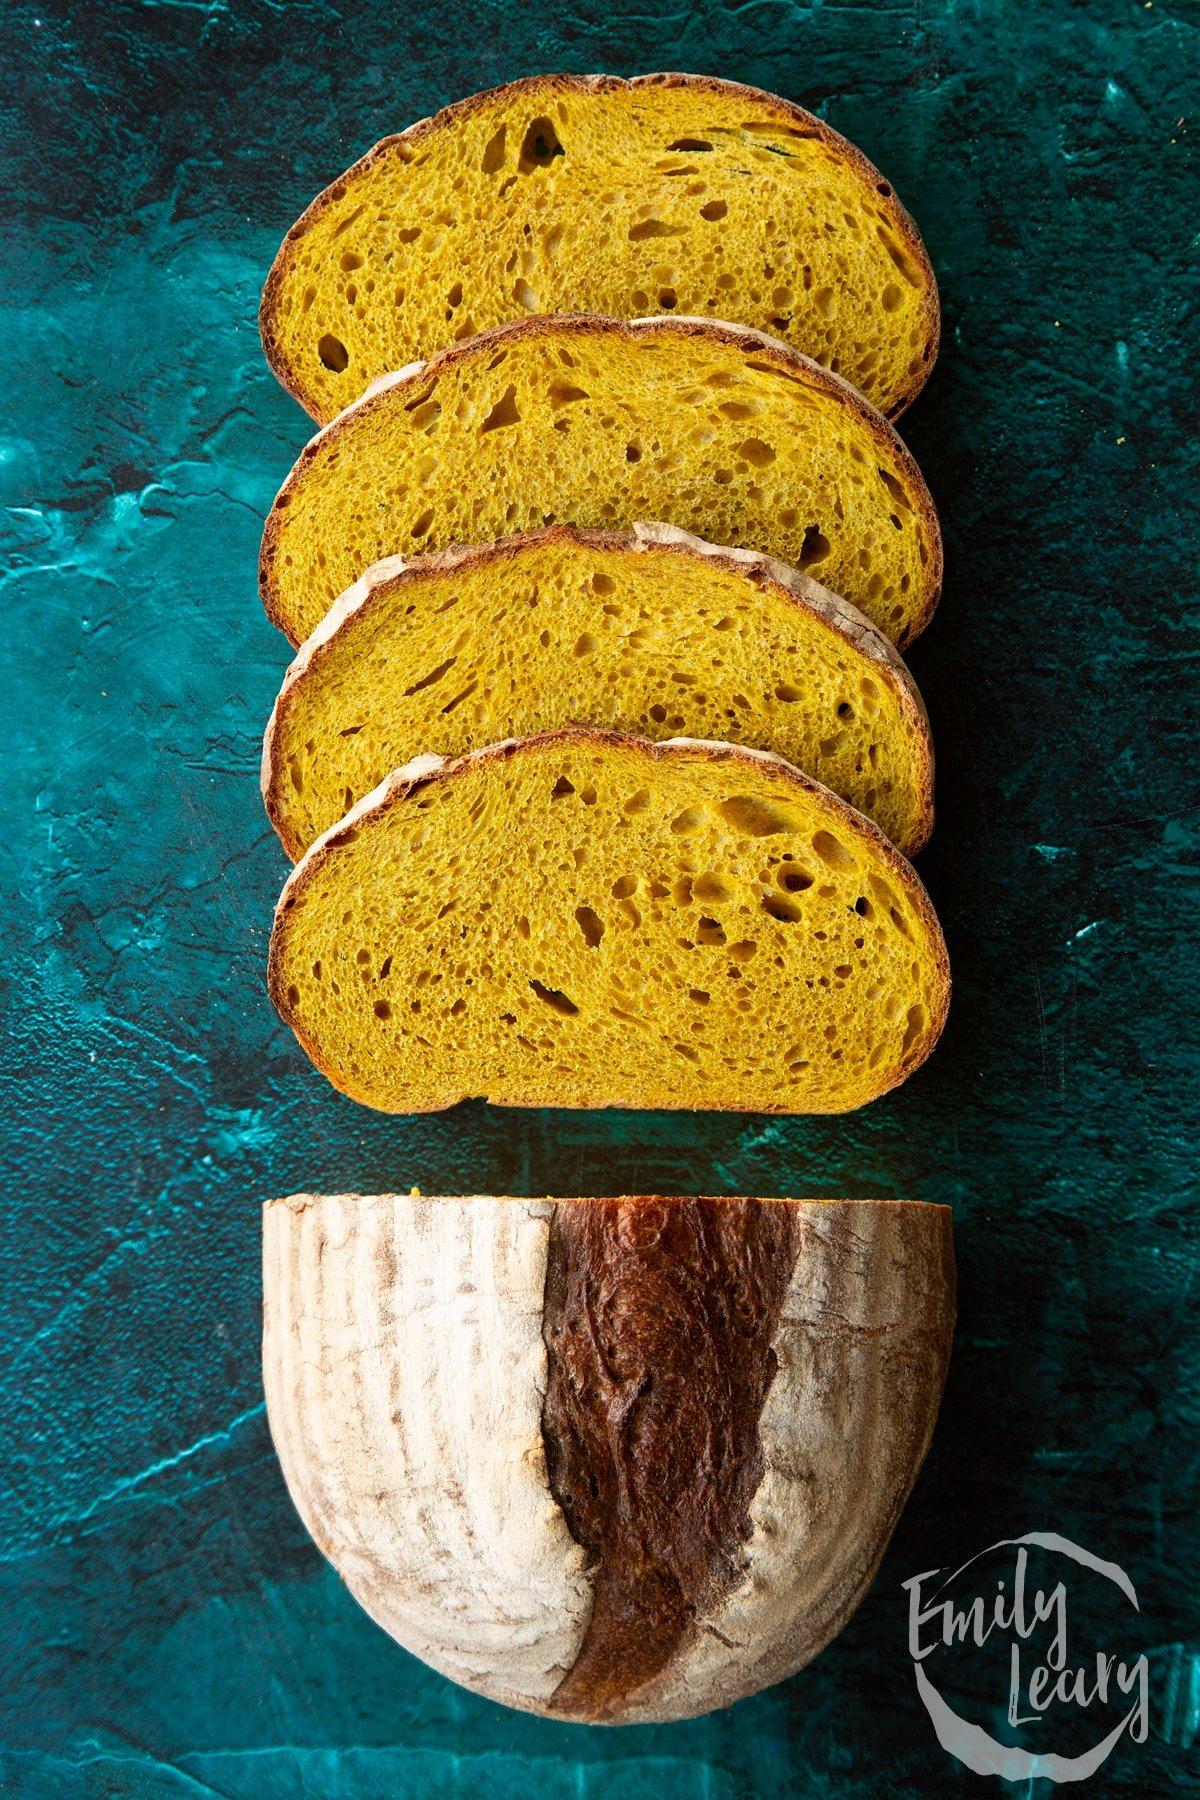 Pumpkin sourdough bread. Some has been cut into slices.